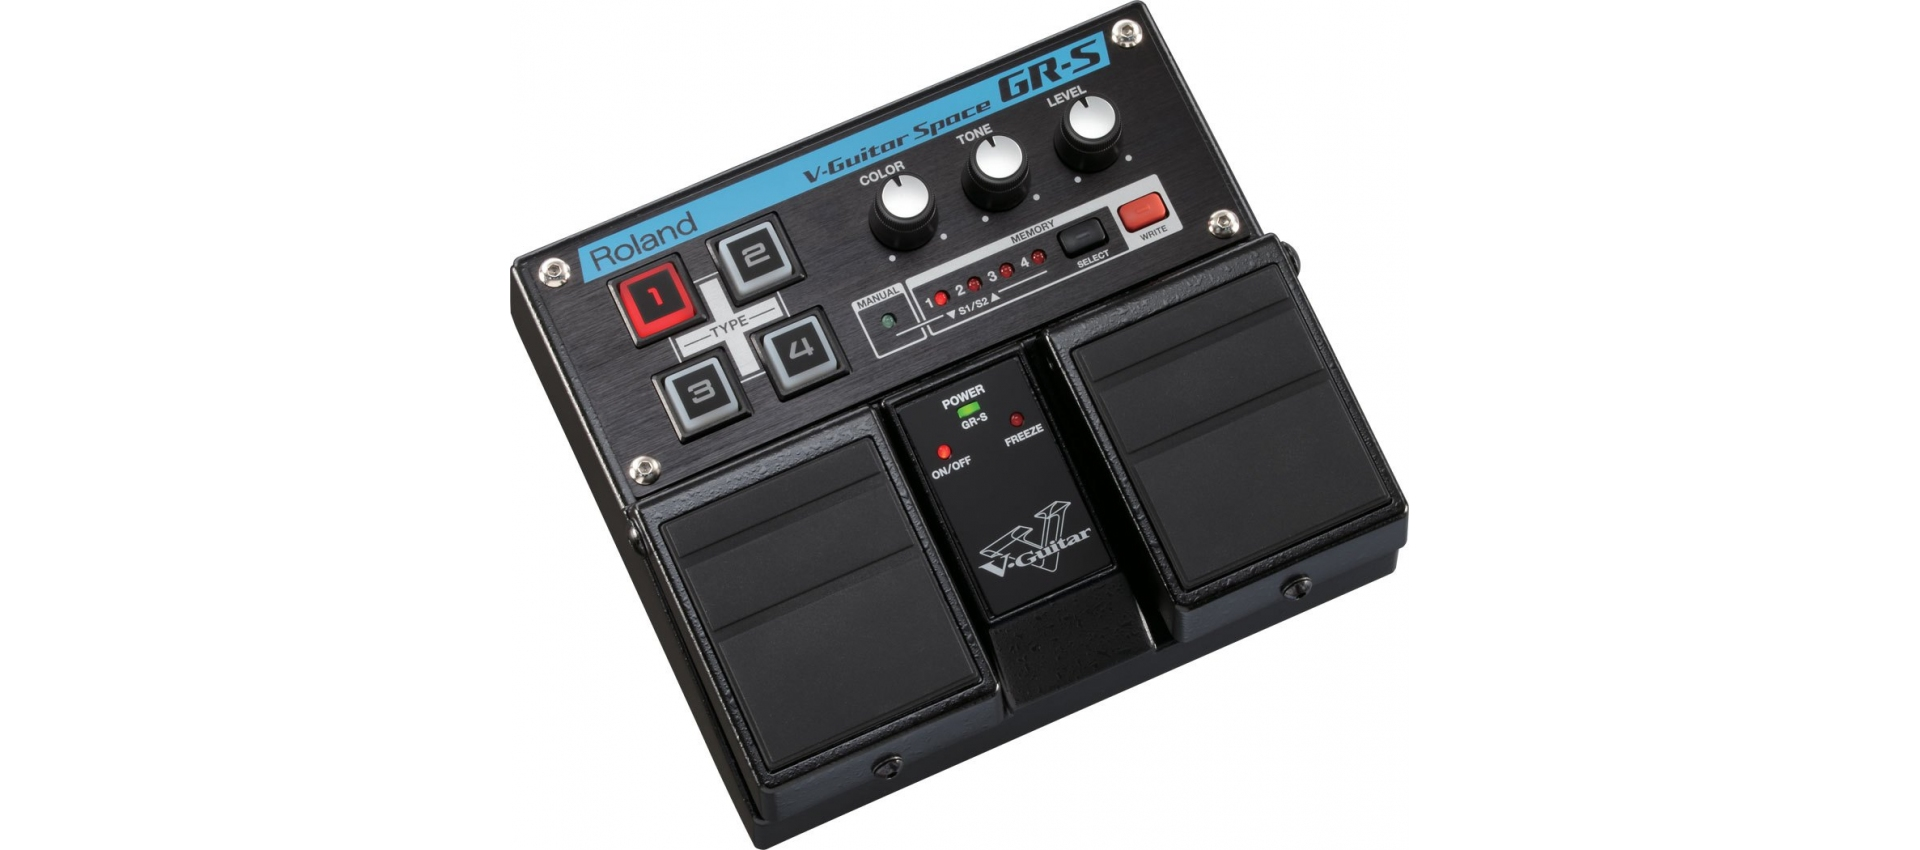 roland grs v guitar space pedal multieffetti pedaliere per chitarra. Black Bedroom Furniture Sets. Home Design Ideas